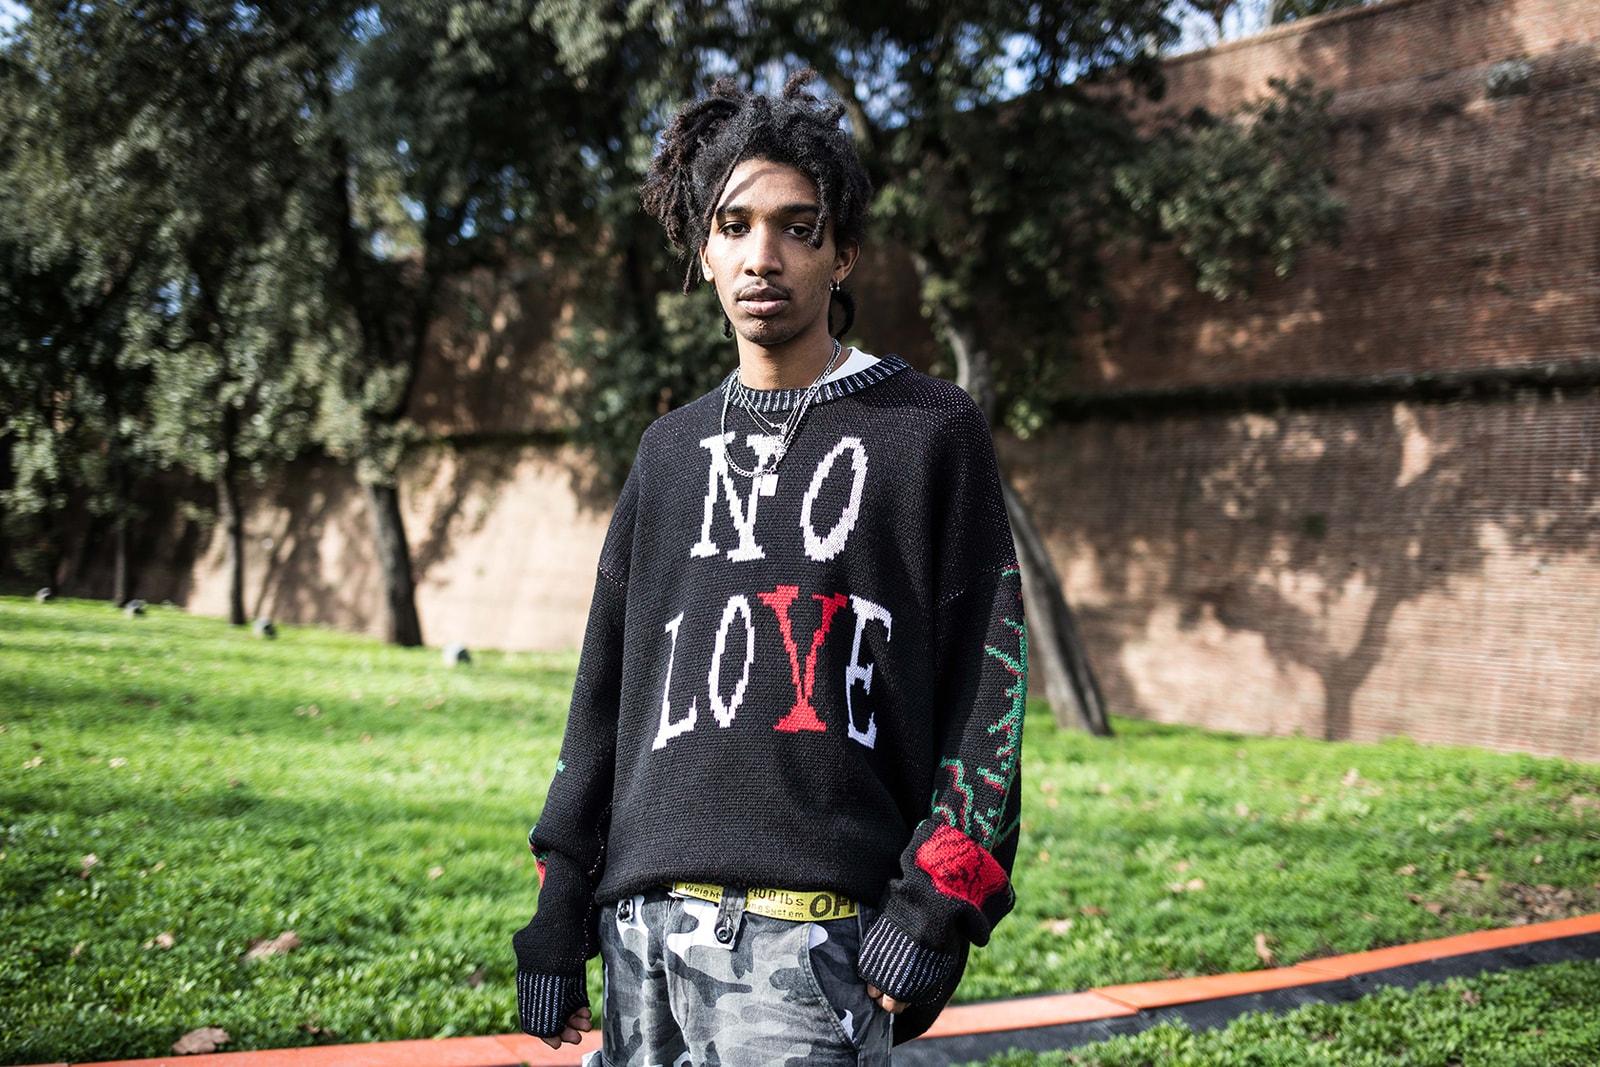 Pitti Uomo 2018 Biggest Trends Fashion Week Menswear Italy Street Style